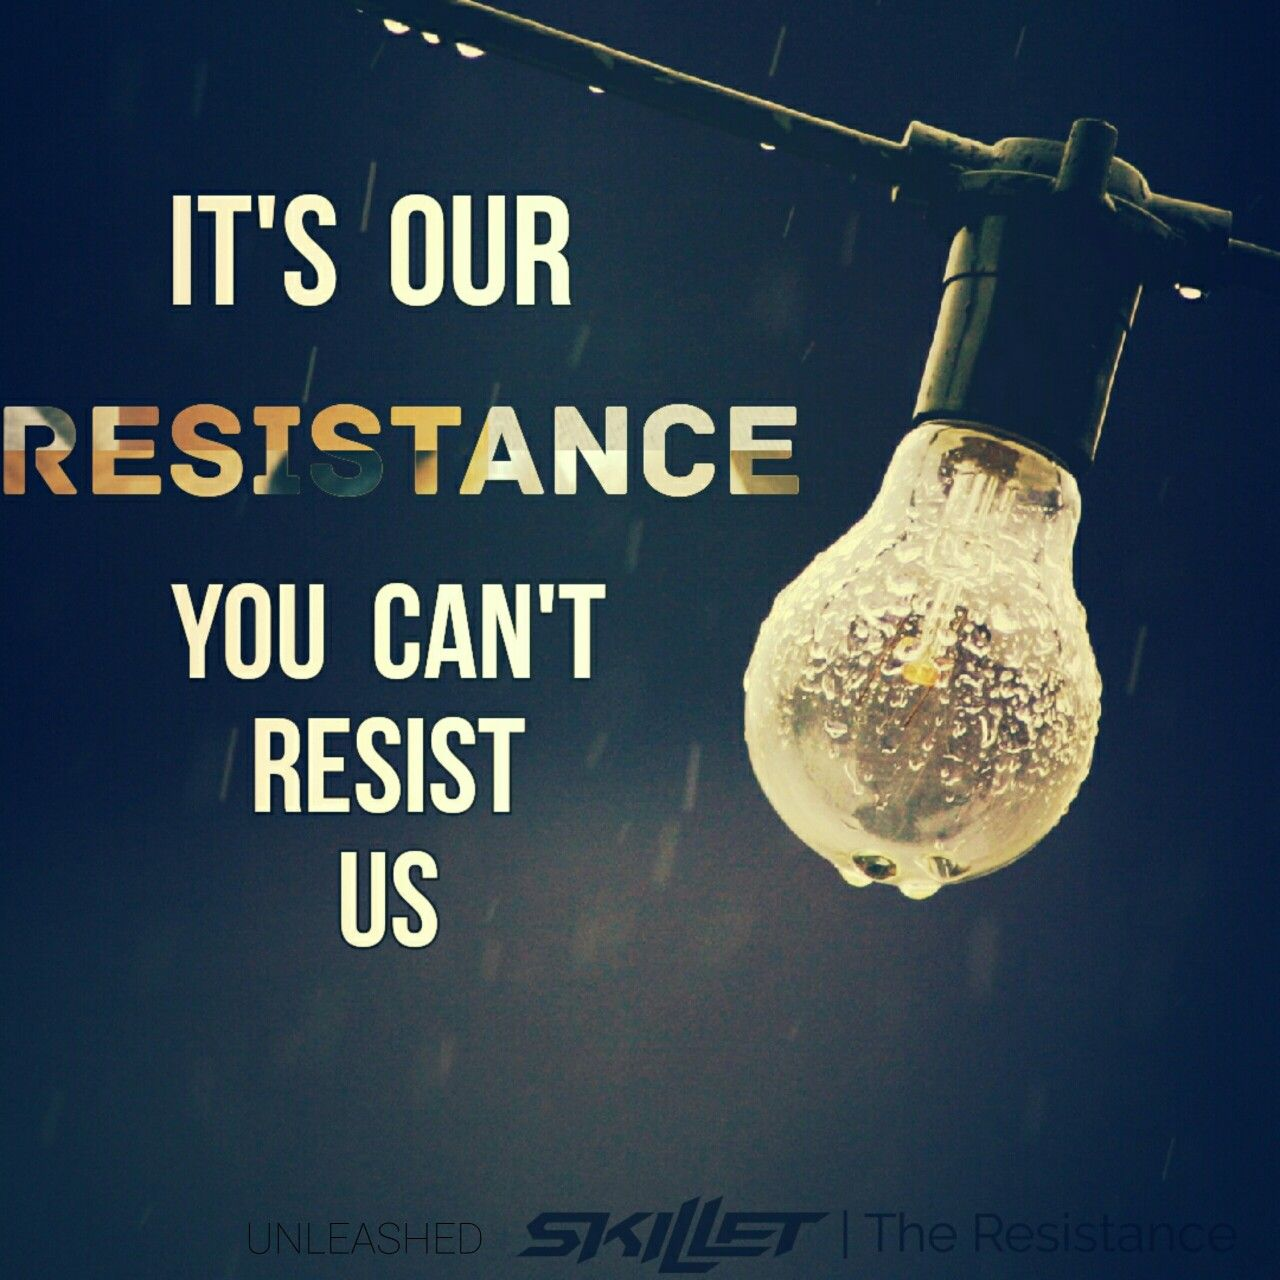 Workout Bands Music: Skillet UNLEASHED The Resistance Wallpaper 2016